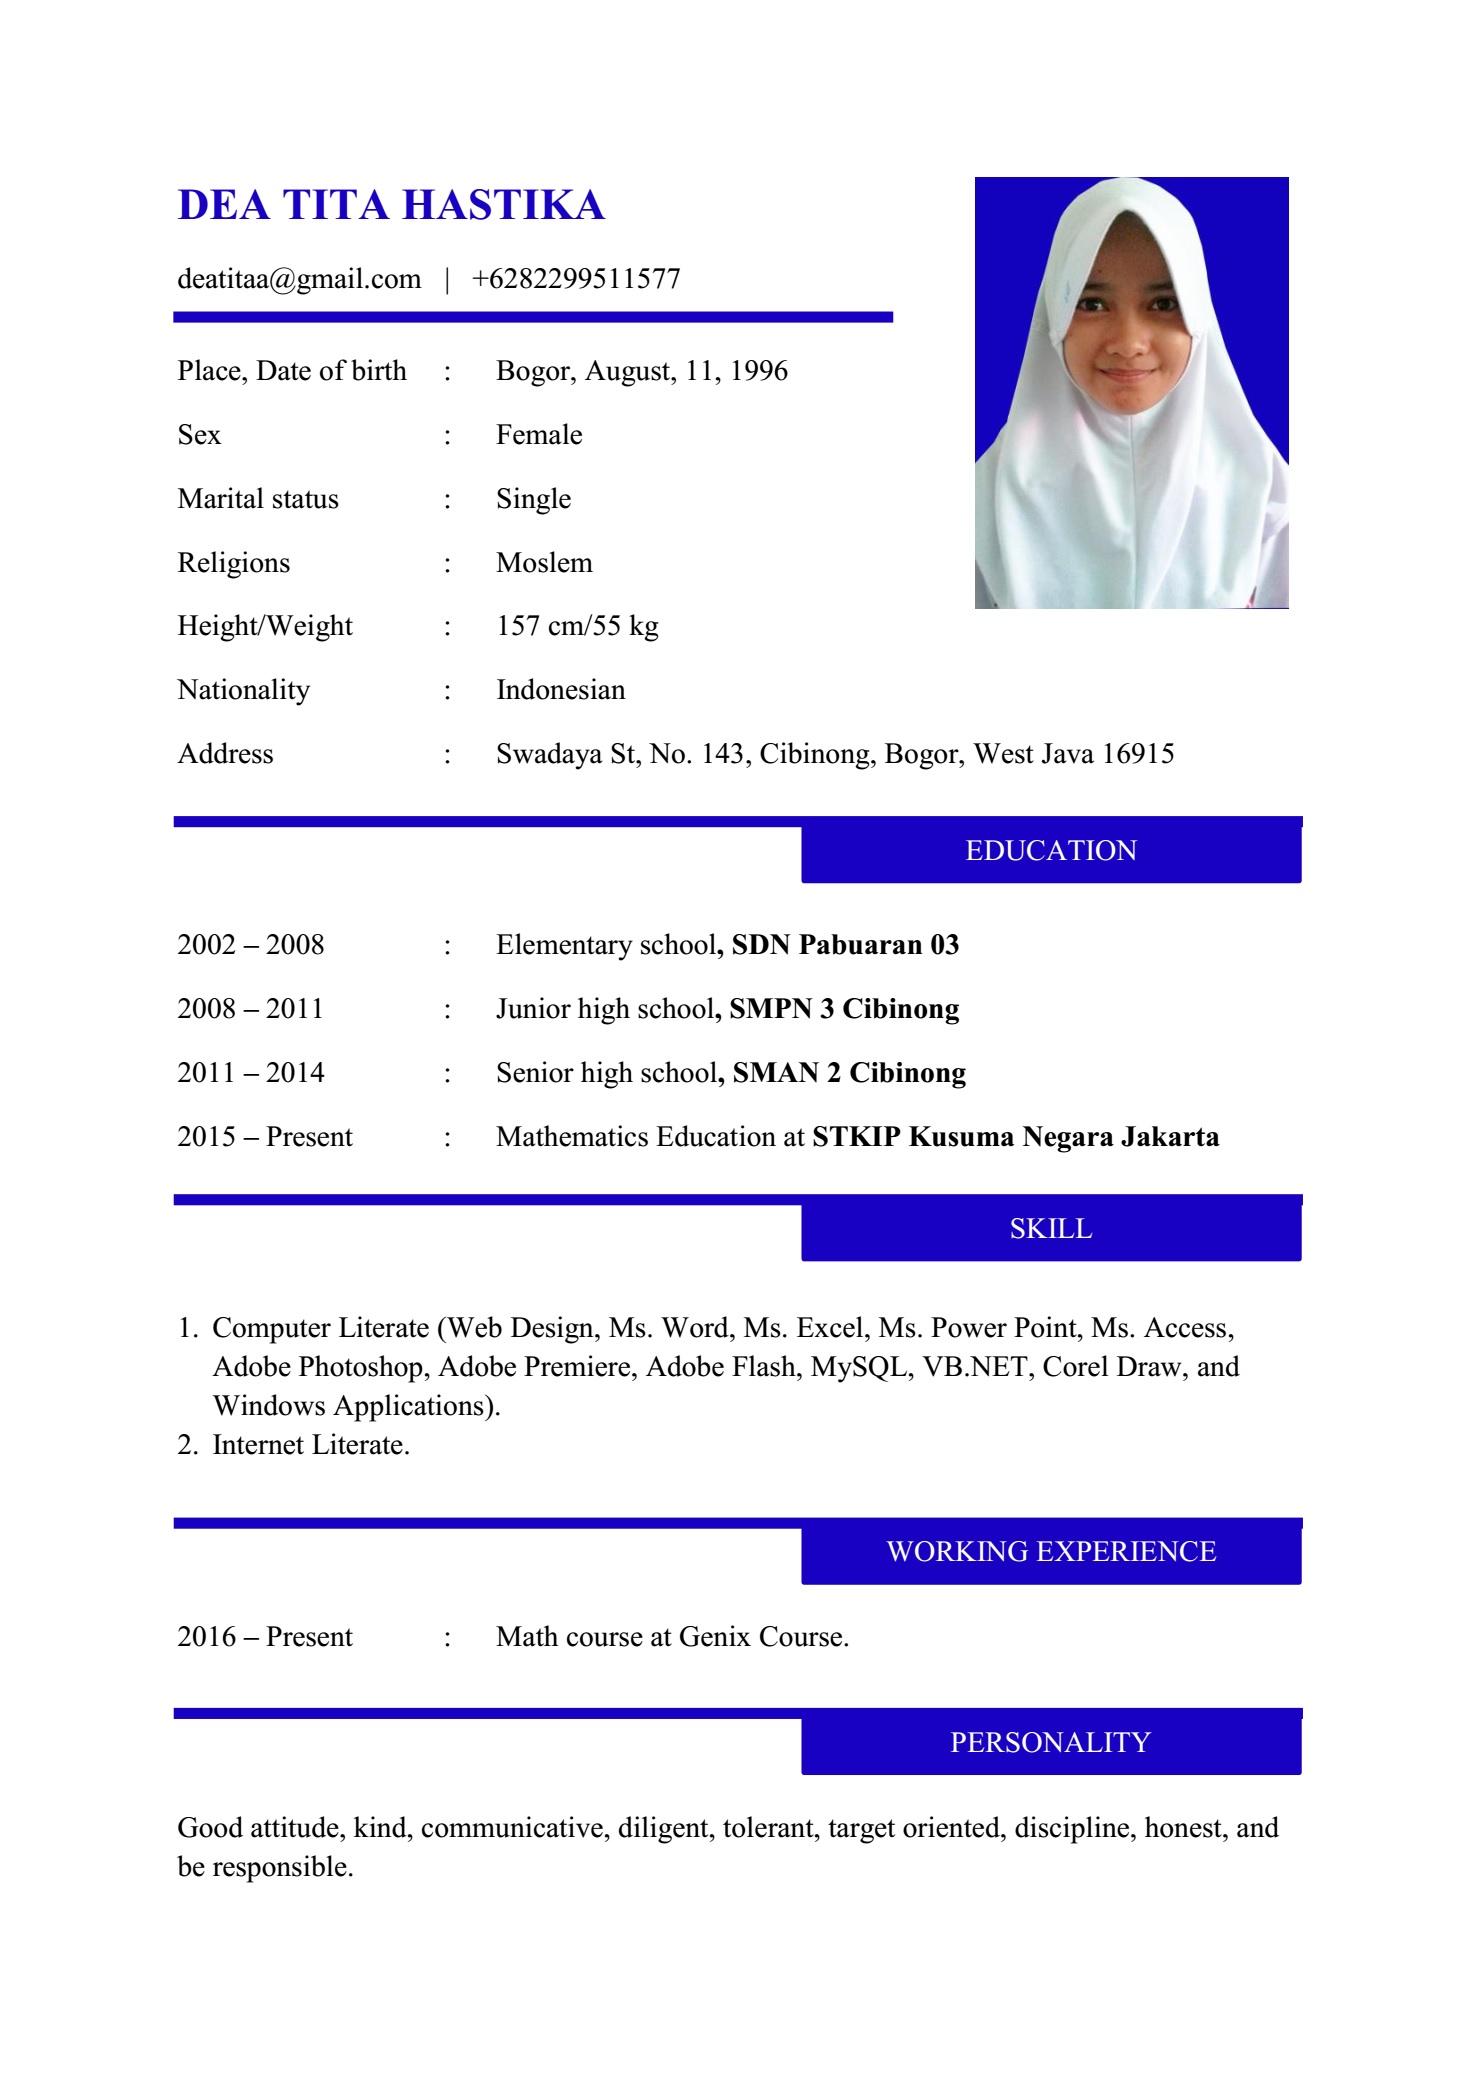 Contoh Curriculum Vitae Dalam Bahasa Inggris Dea Tita Hastika